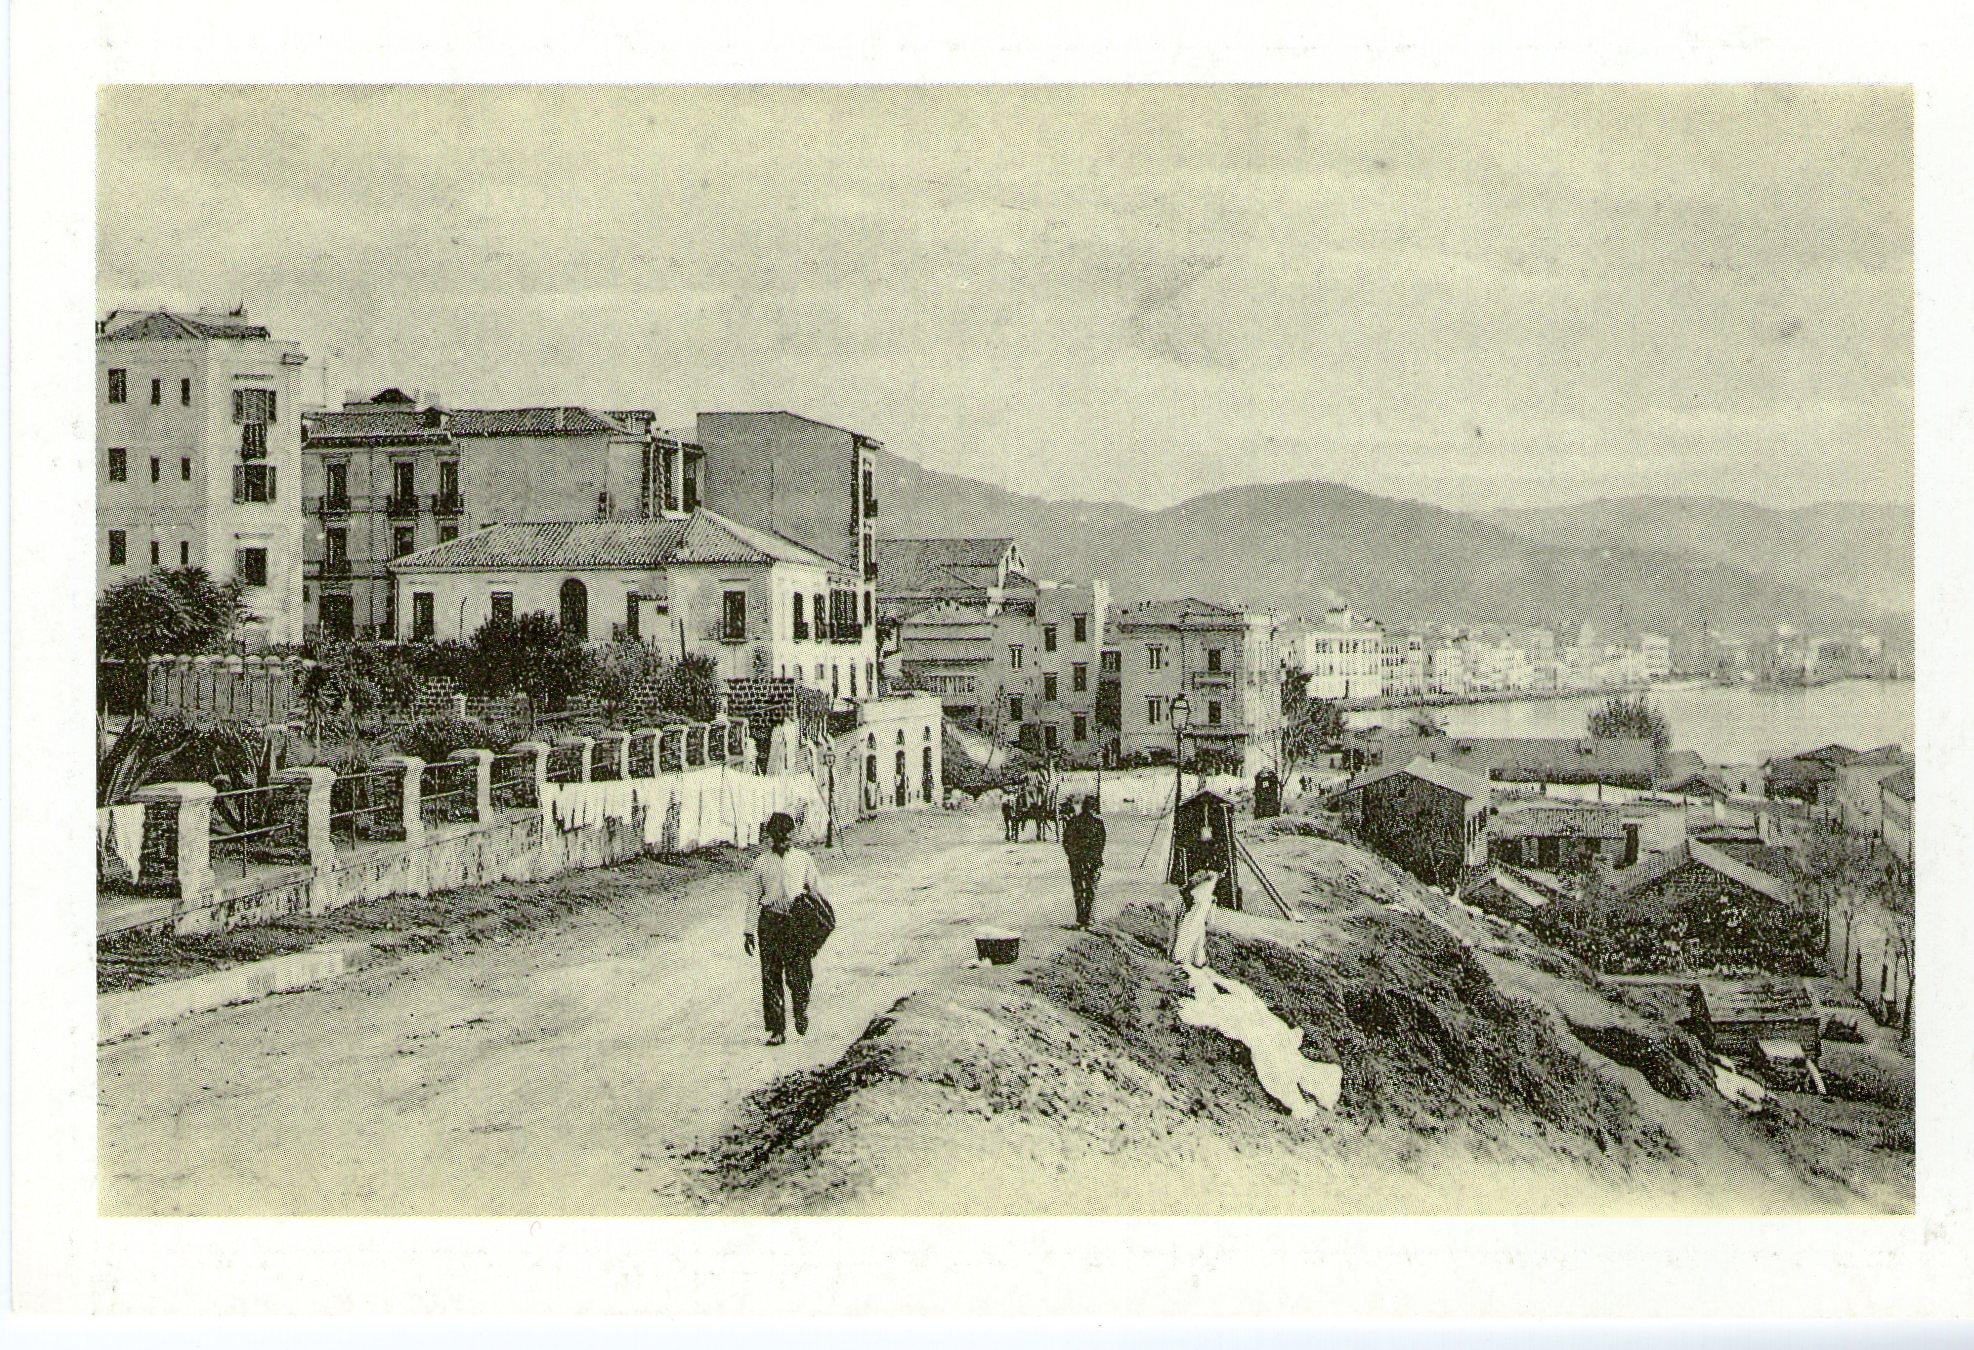 Via alla marina - 1910